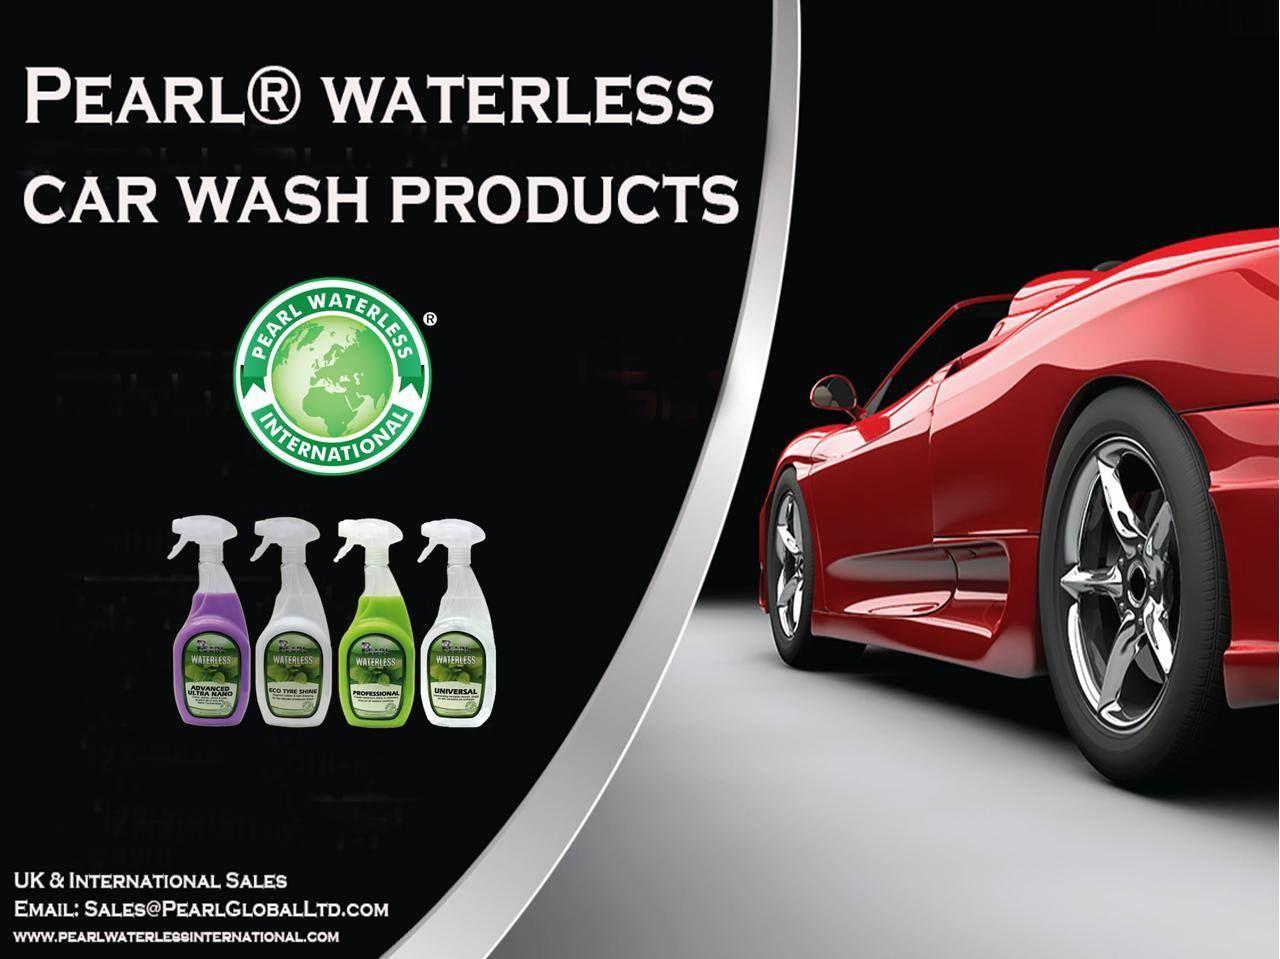 Pearl® Waterless Car Wash Products Waterless car wash